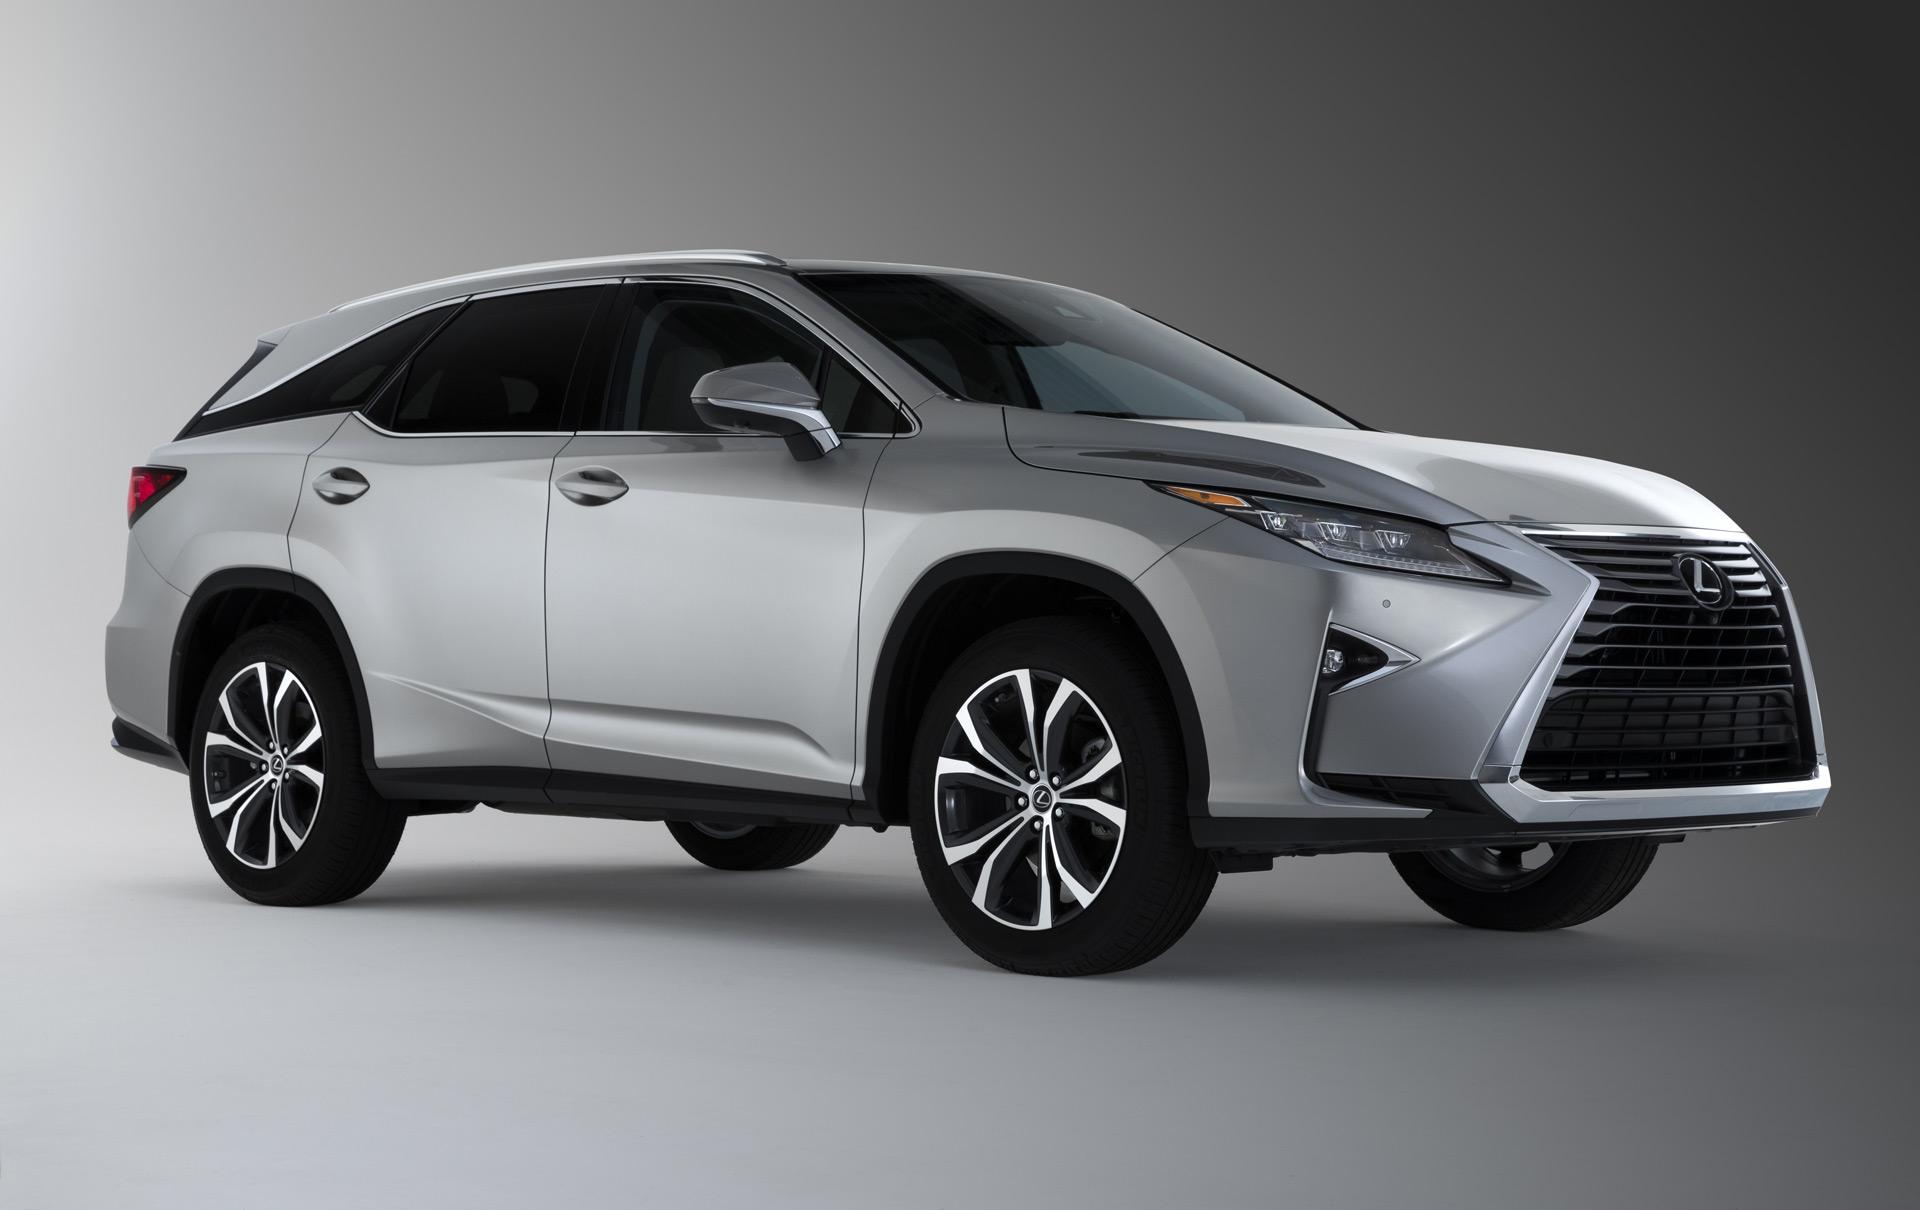 2018 Lexus RX Performance Review The Car Connection